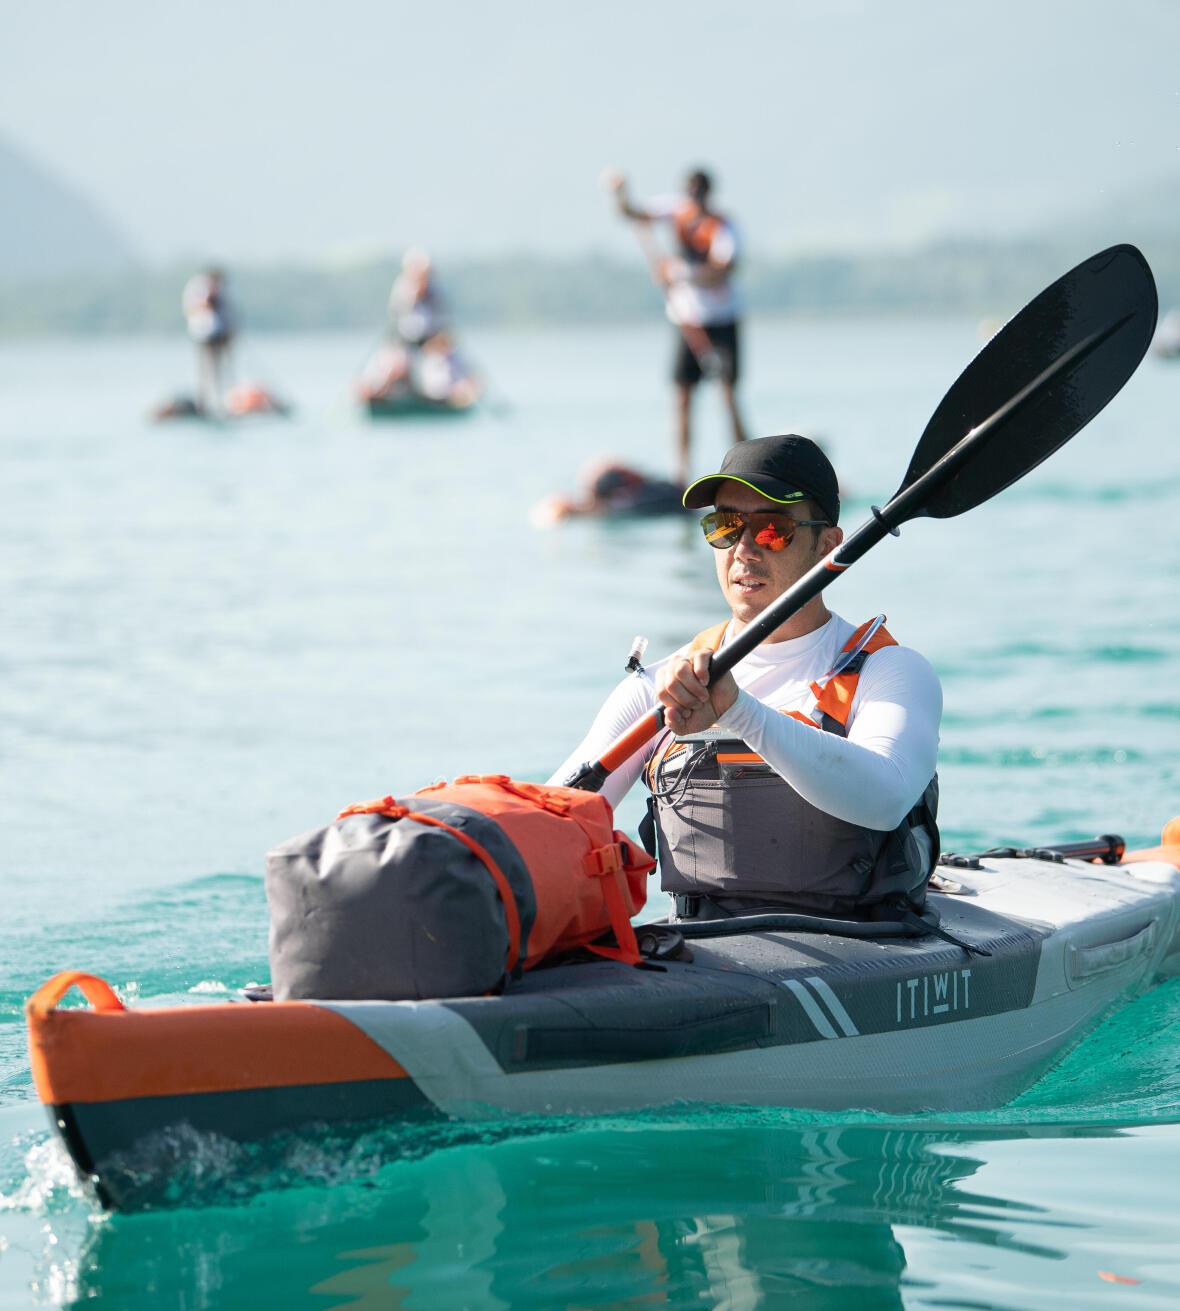 waterproof container itiwit kayak